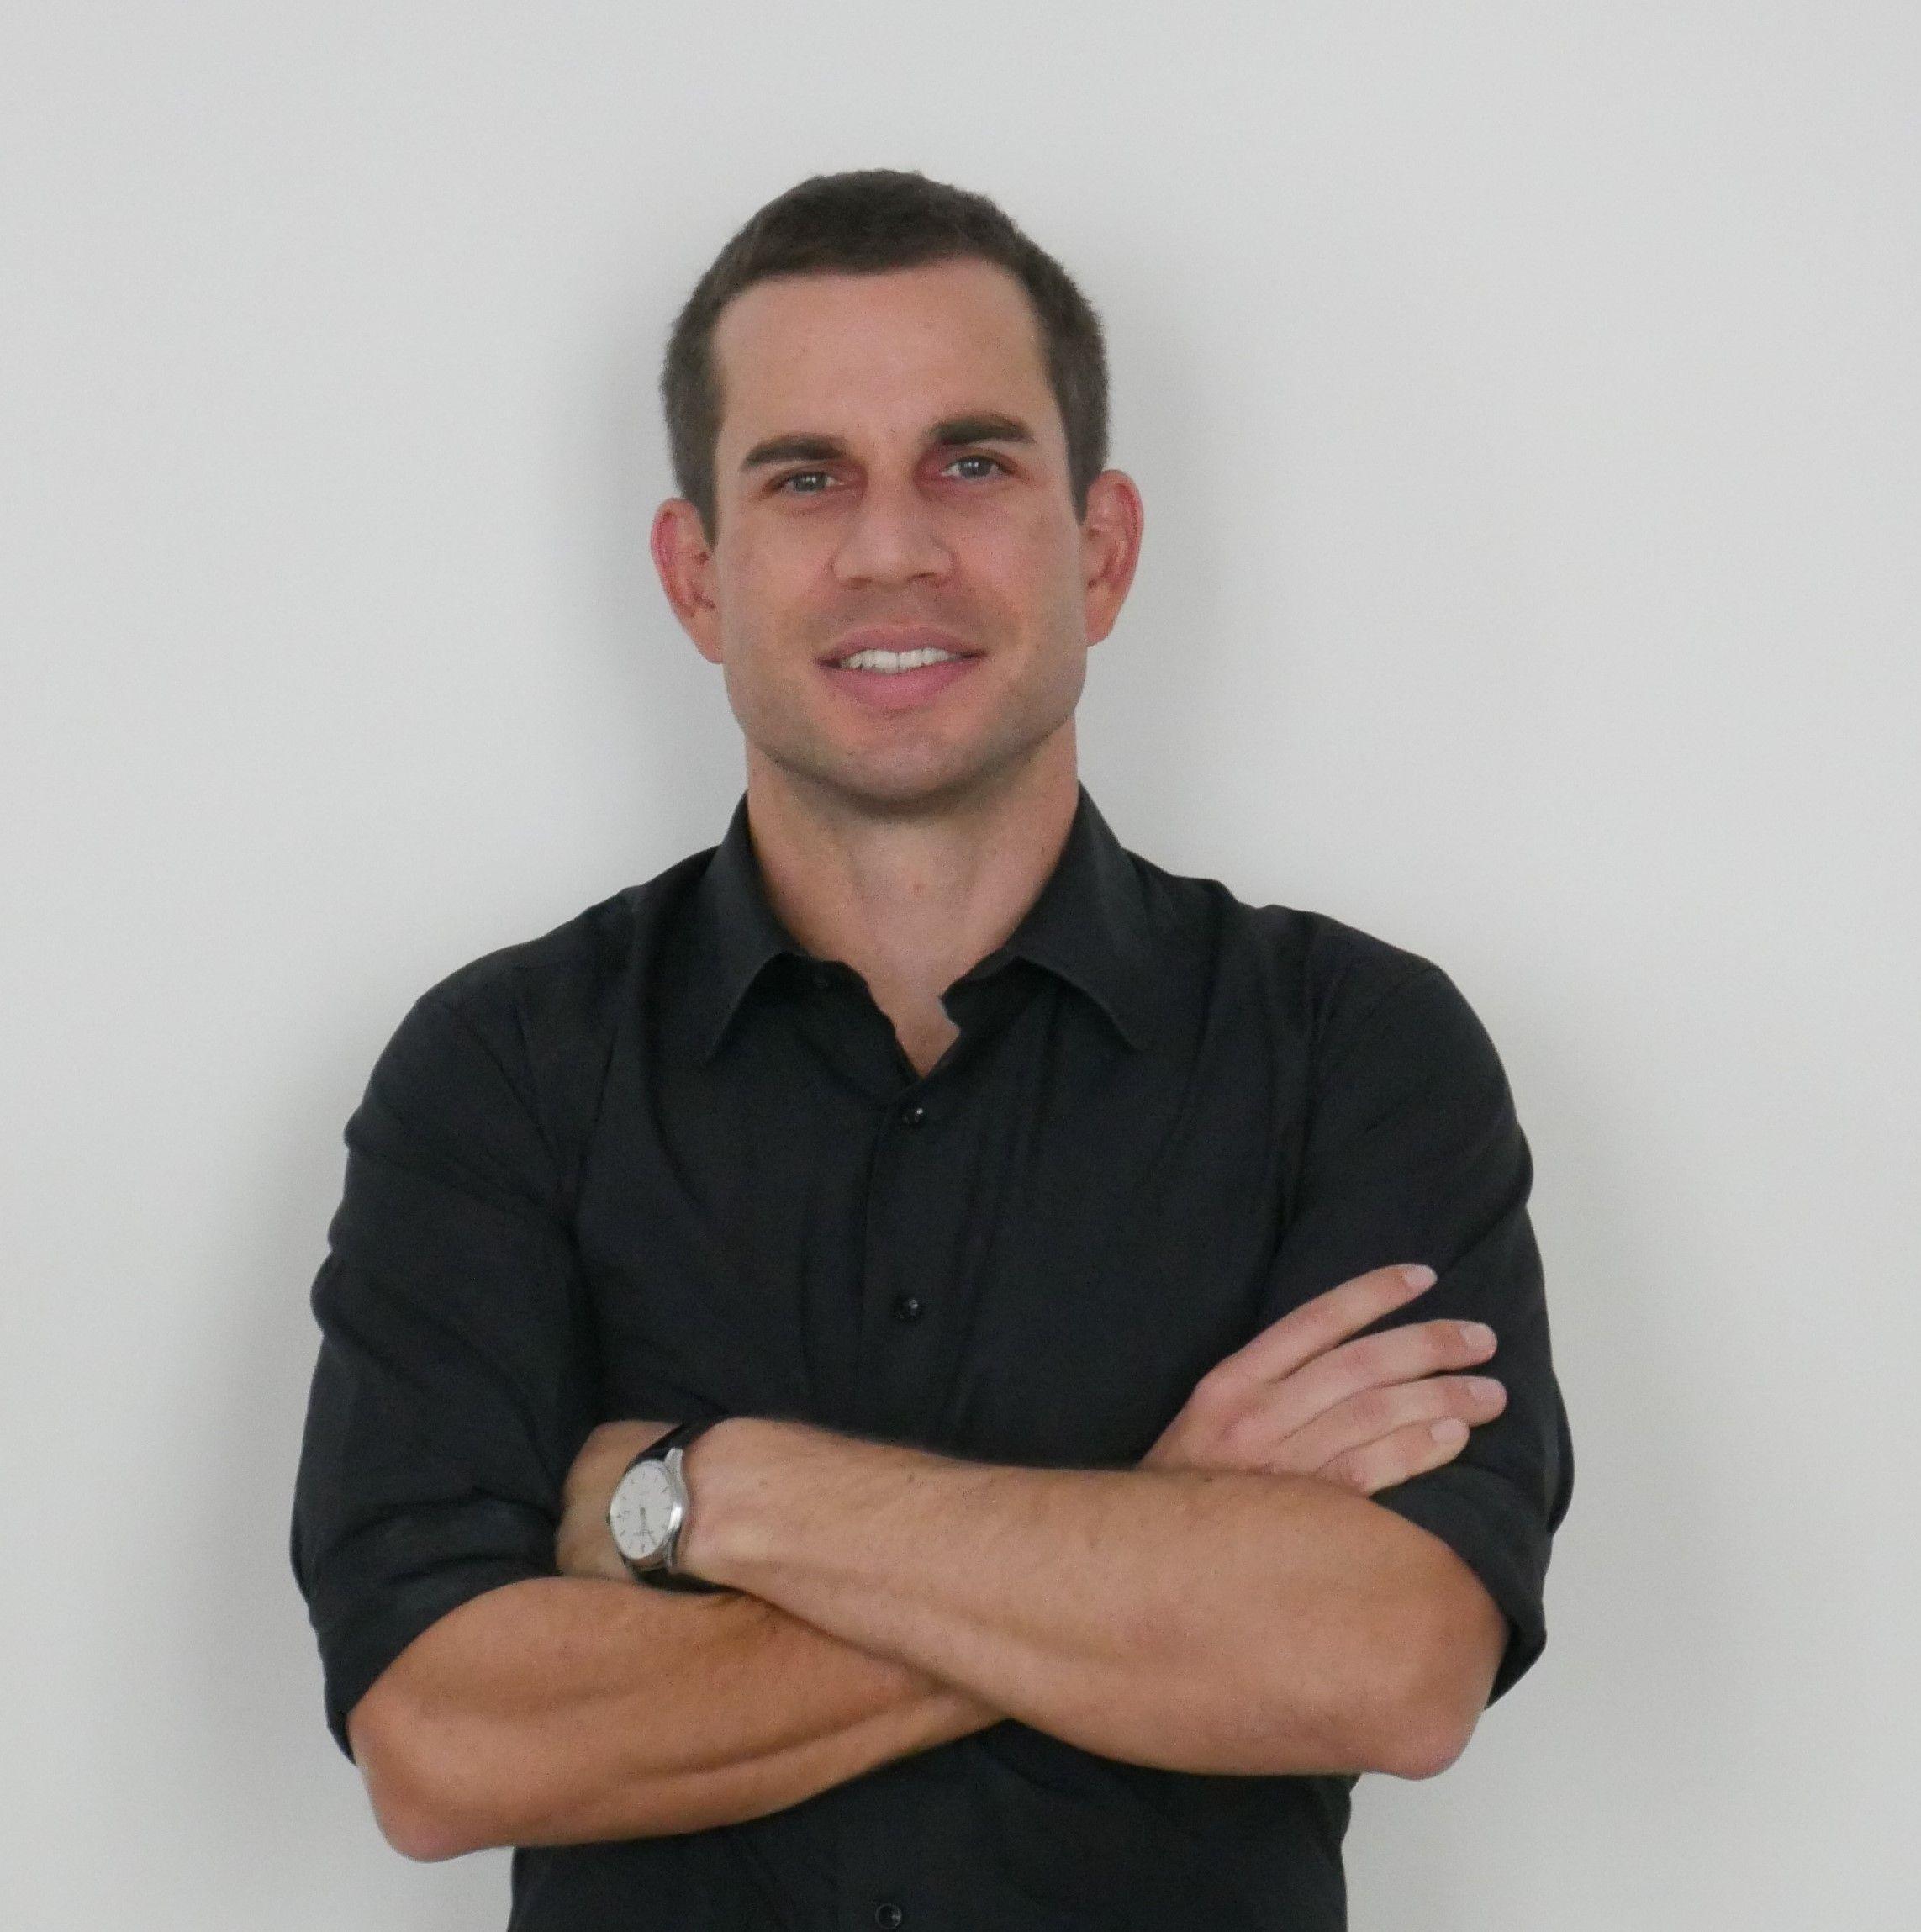 Maxime Sbaihi